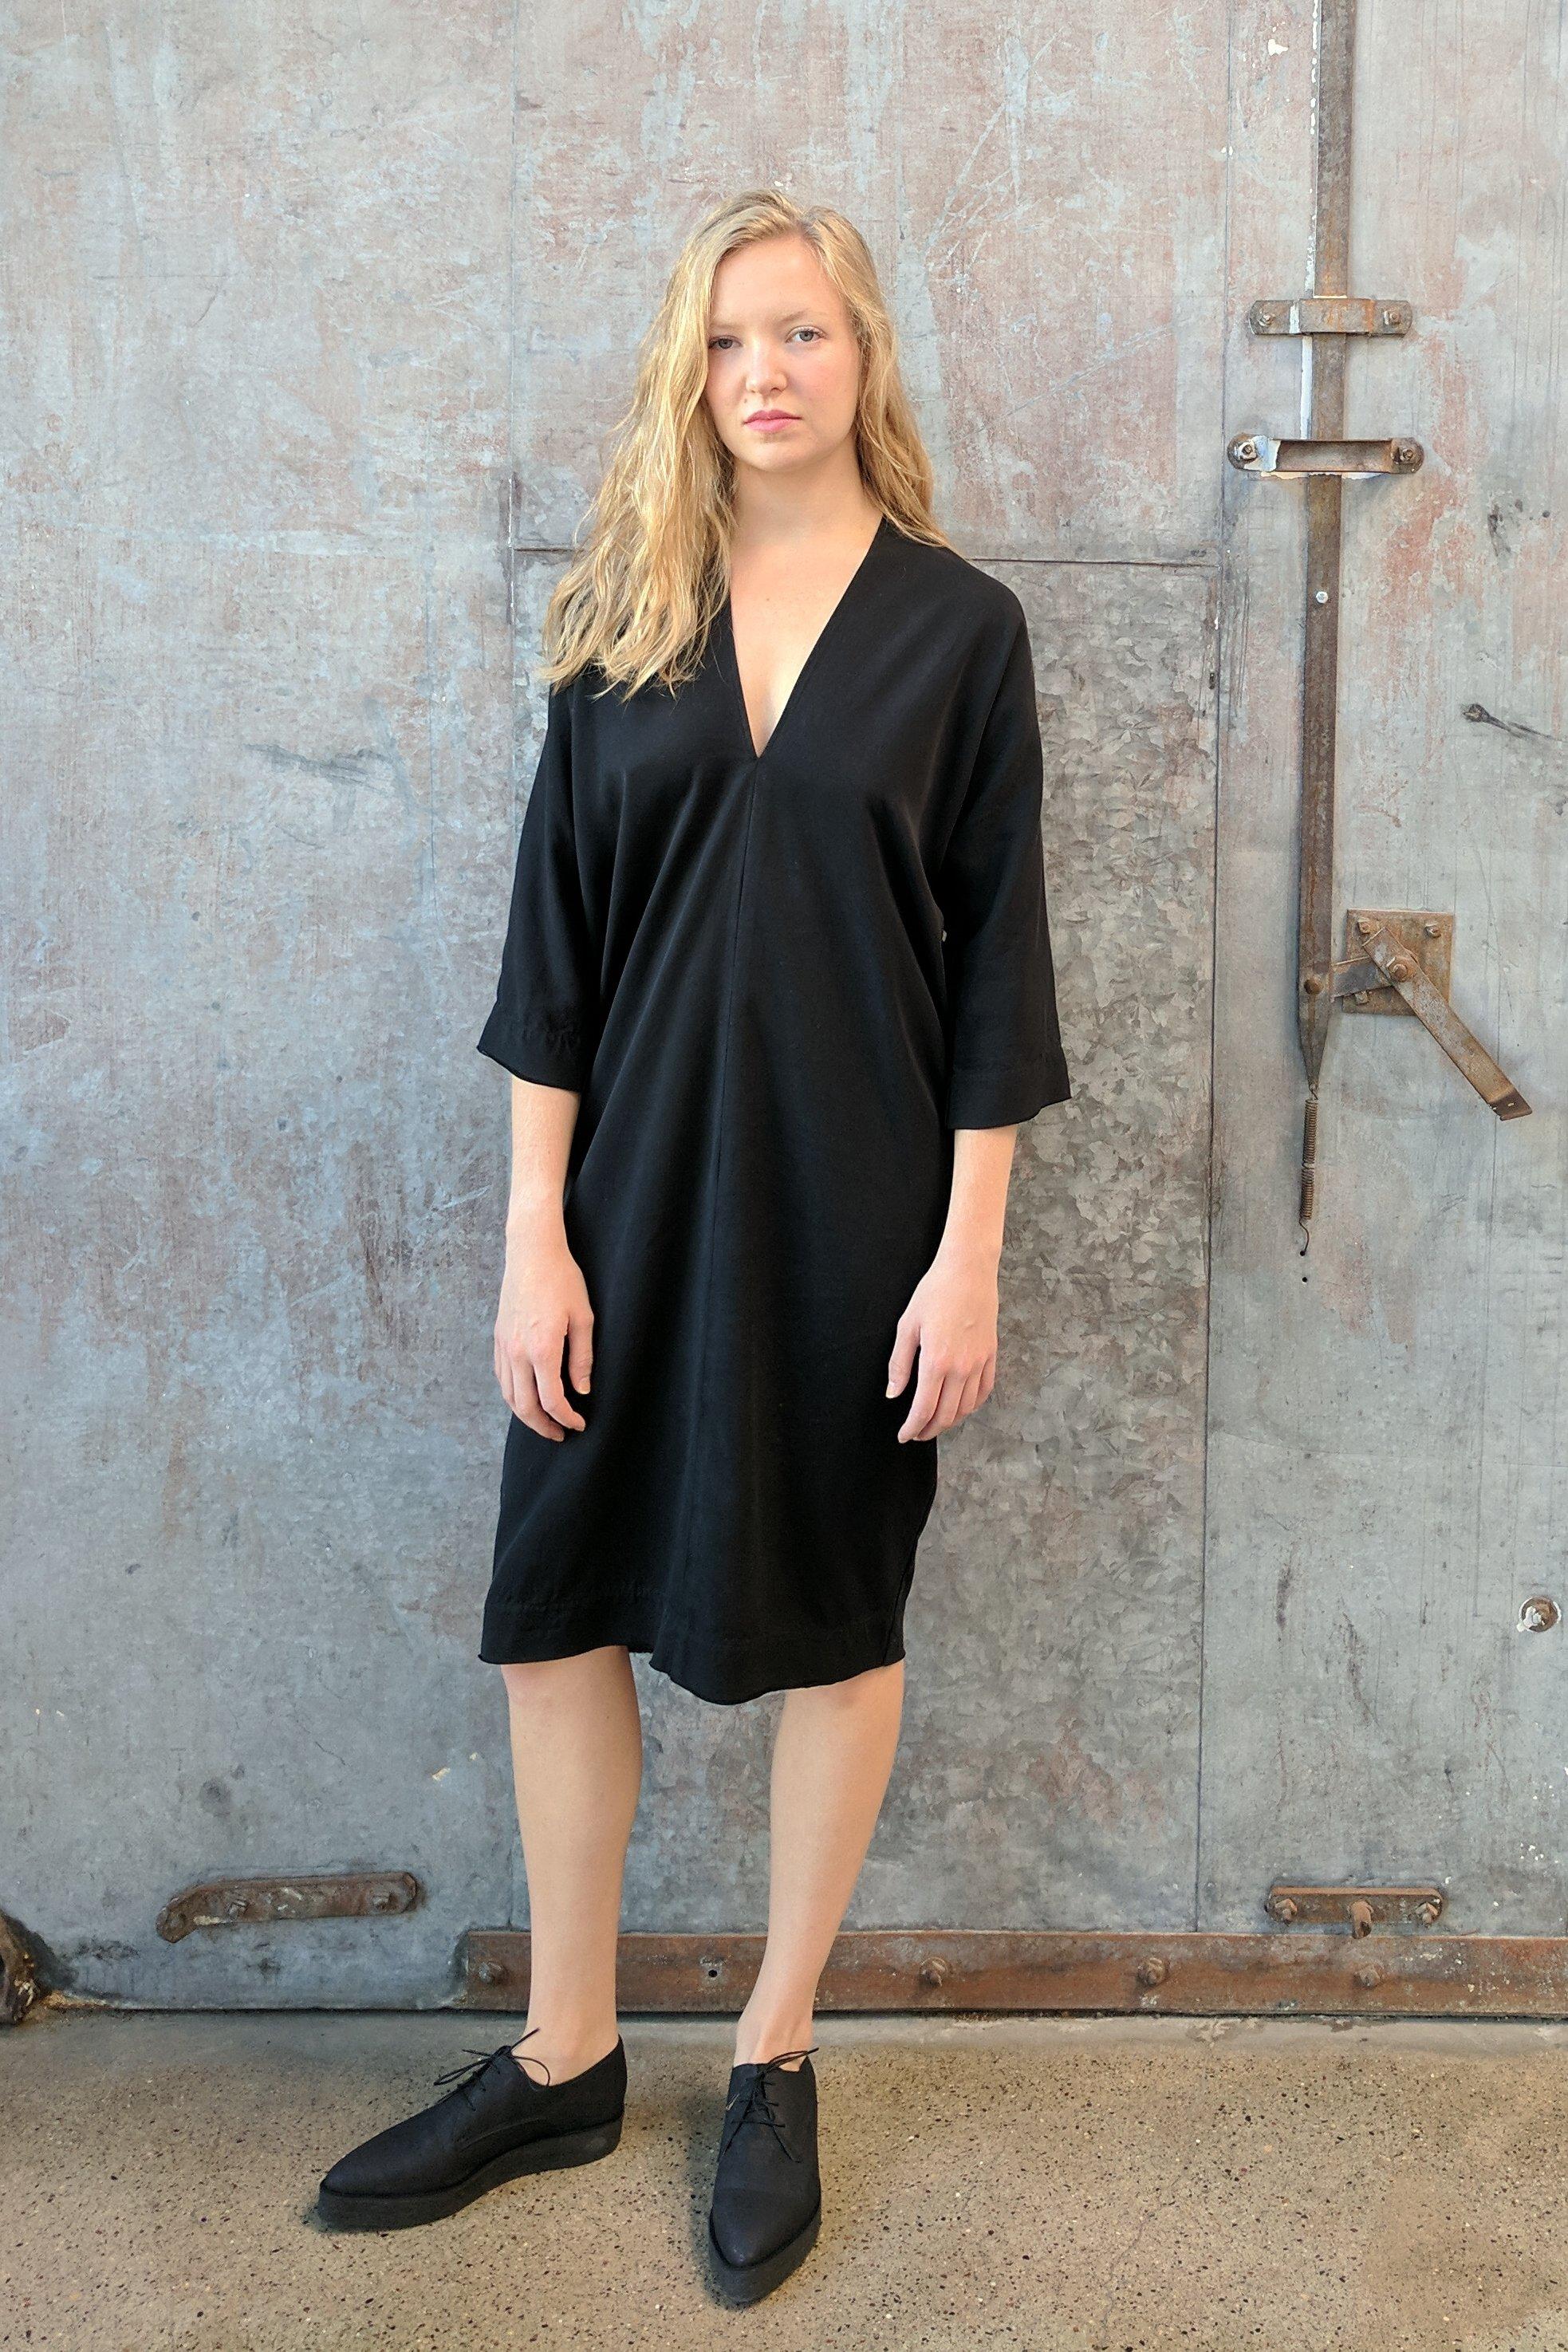 c337dfa1a Hackwith Design House Raw Finish Cocoon Dress // Black Tencel ...